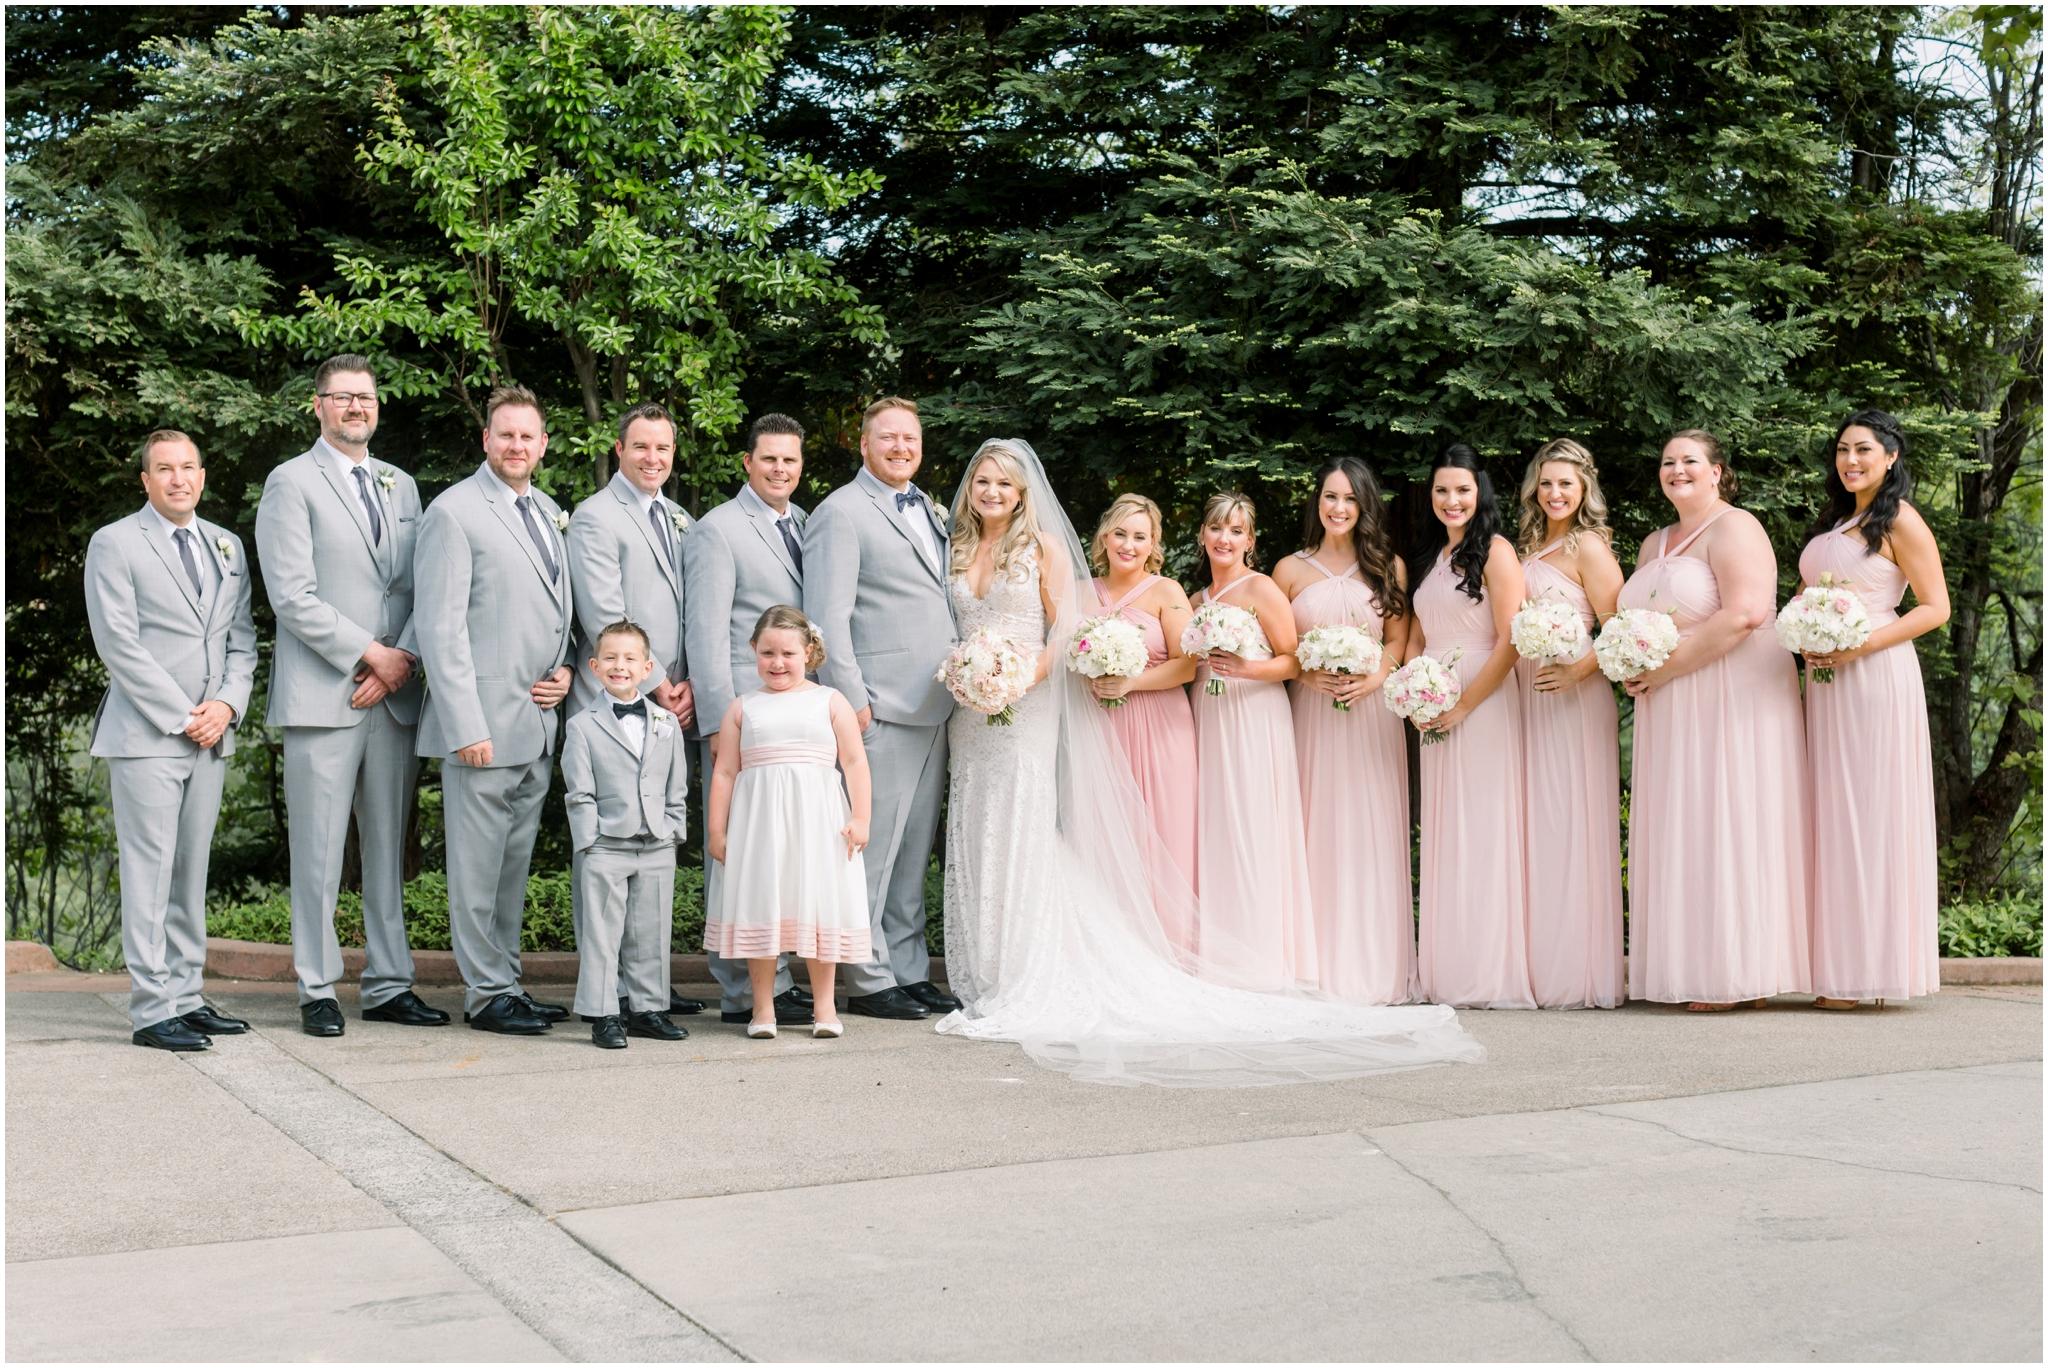 cindy_joseph_wedding_redding_blog_0019.jpg